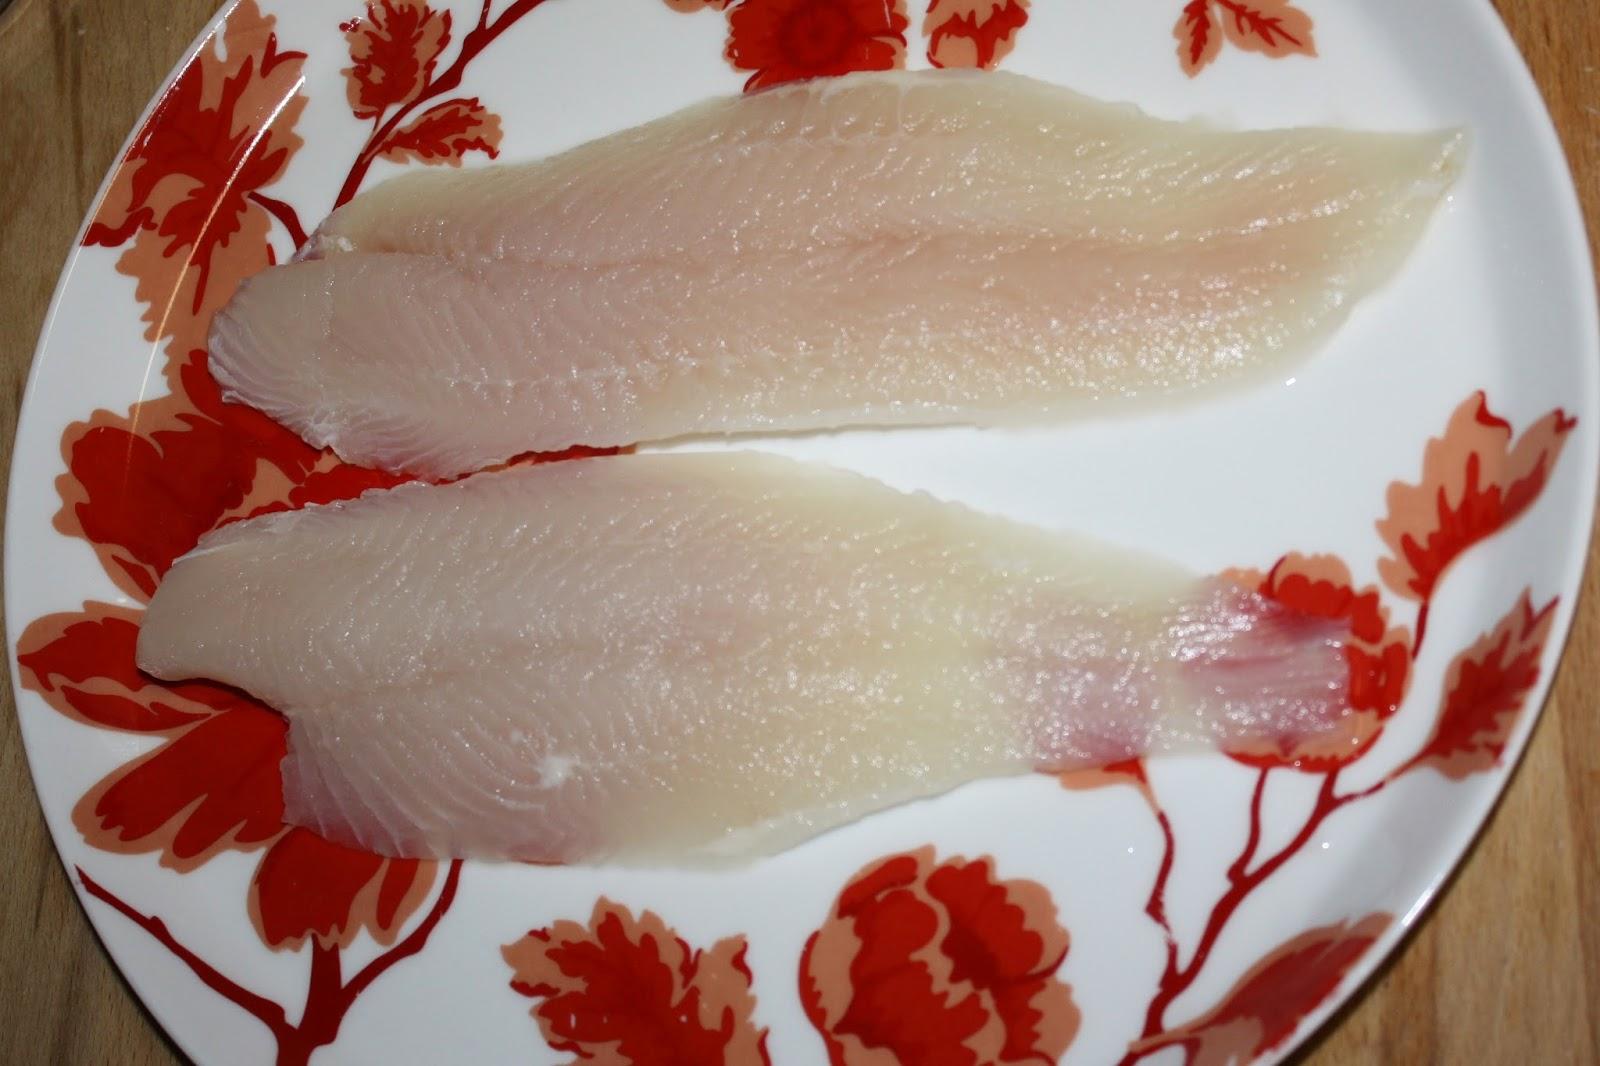 Emilycanbake cajun swai for Swai fish fillet